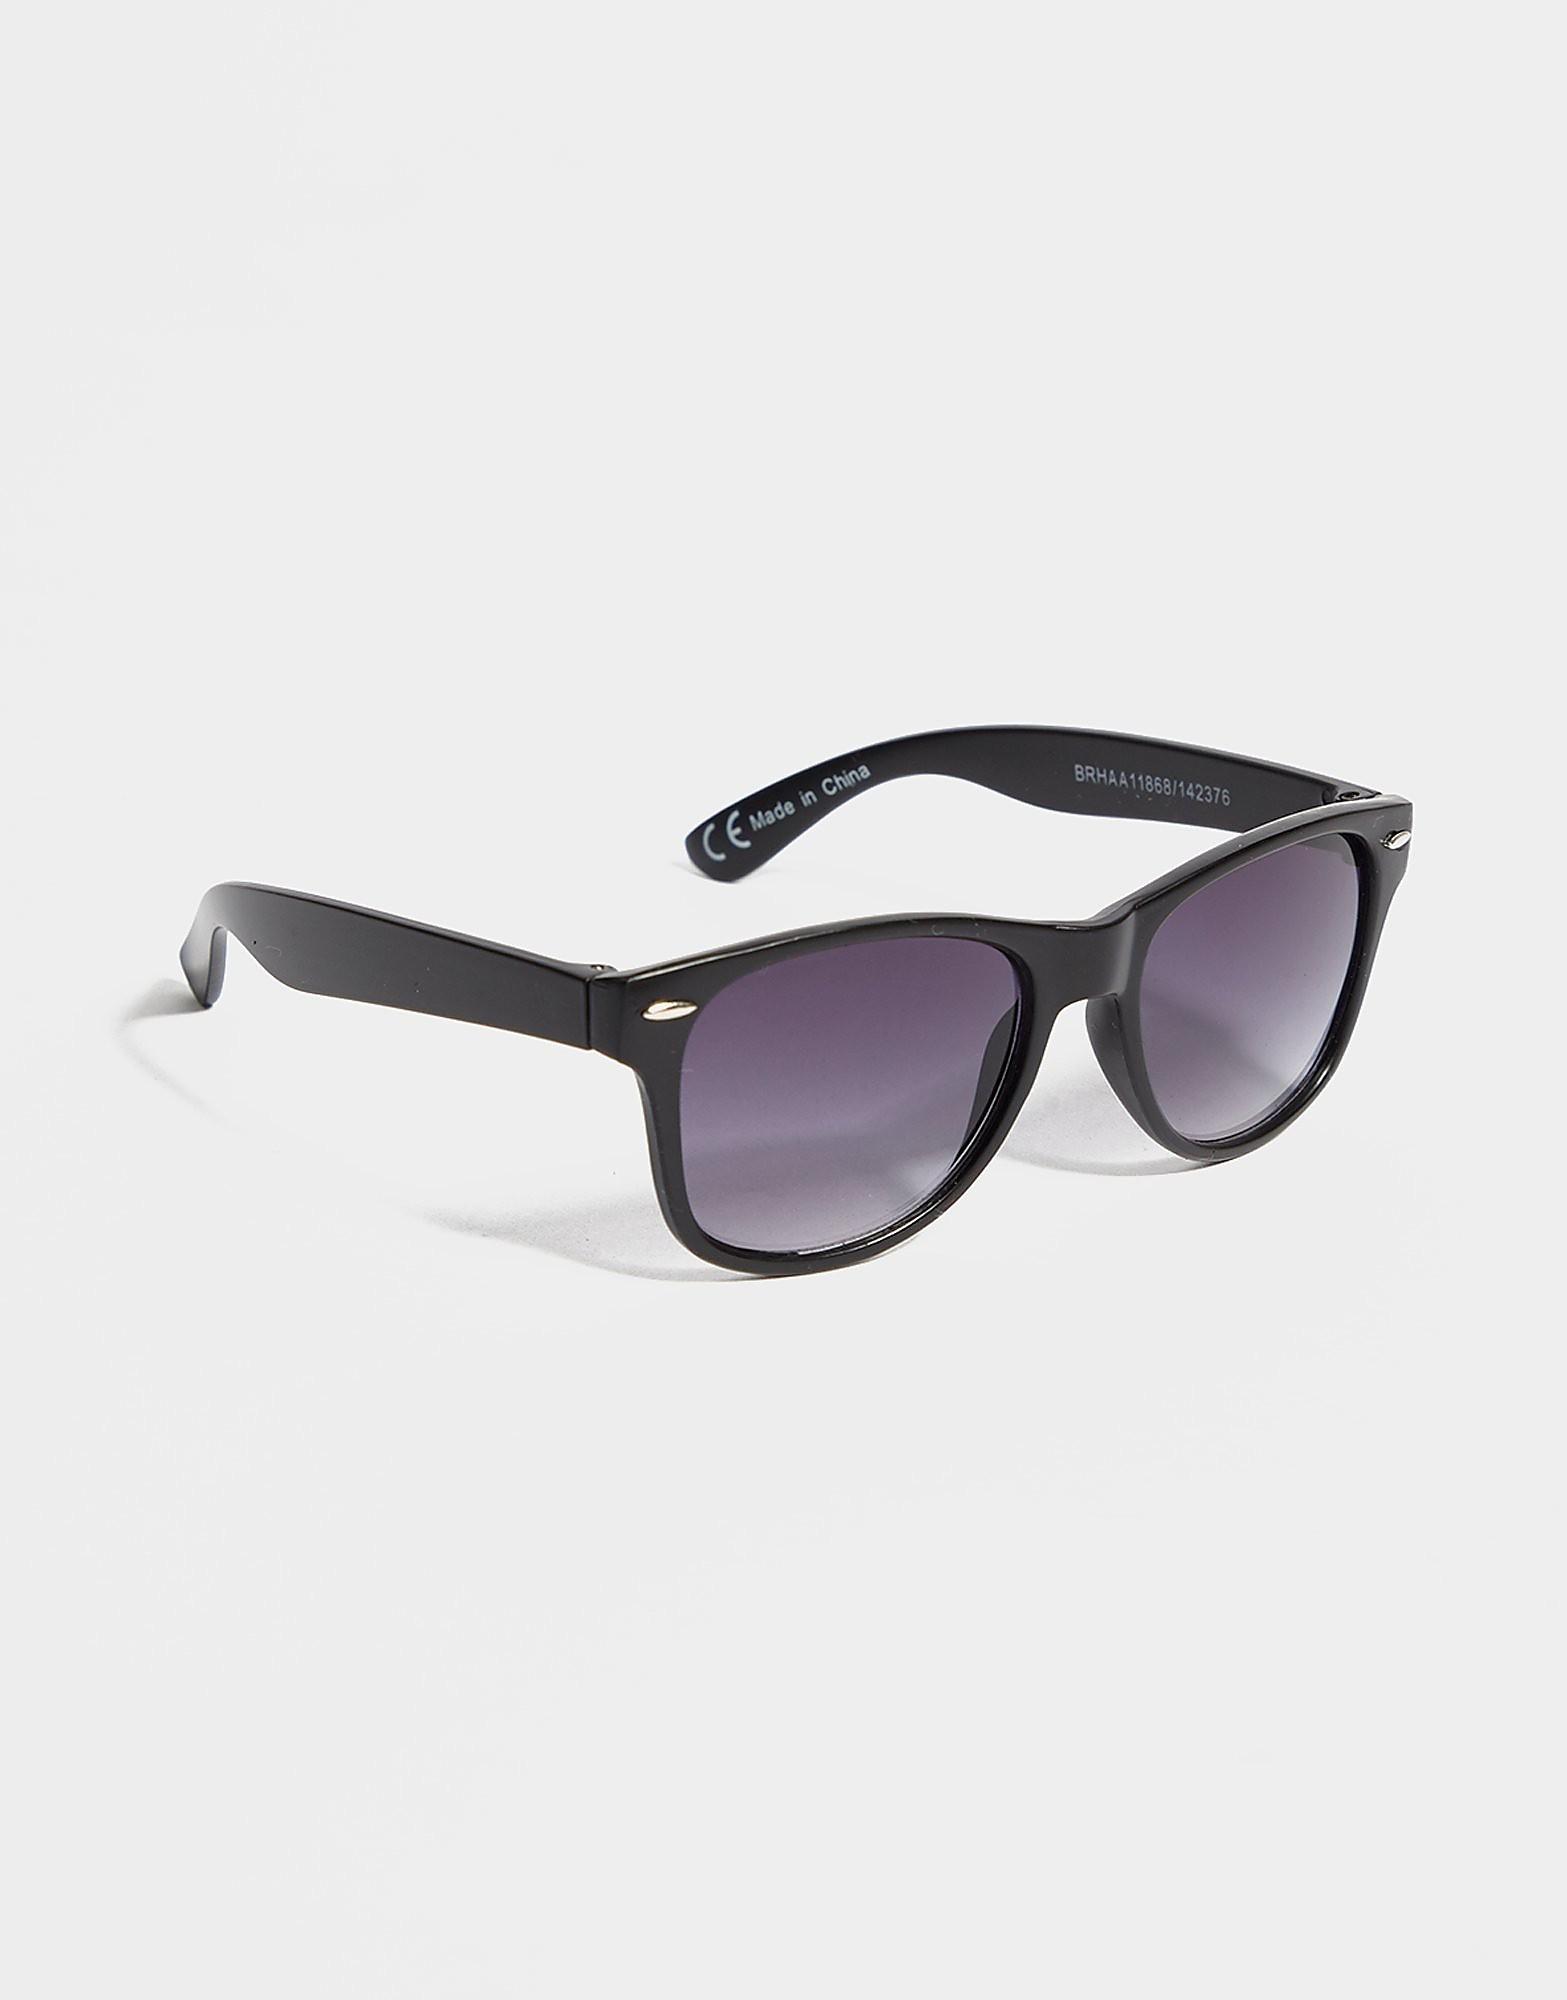 Brookhaven Bobby Sunglasses